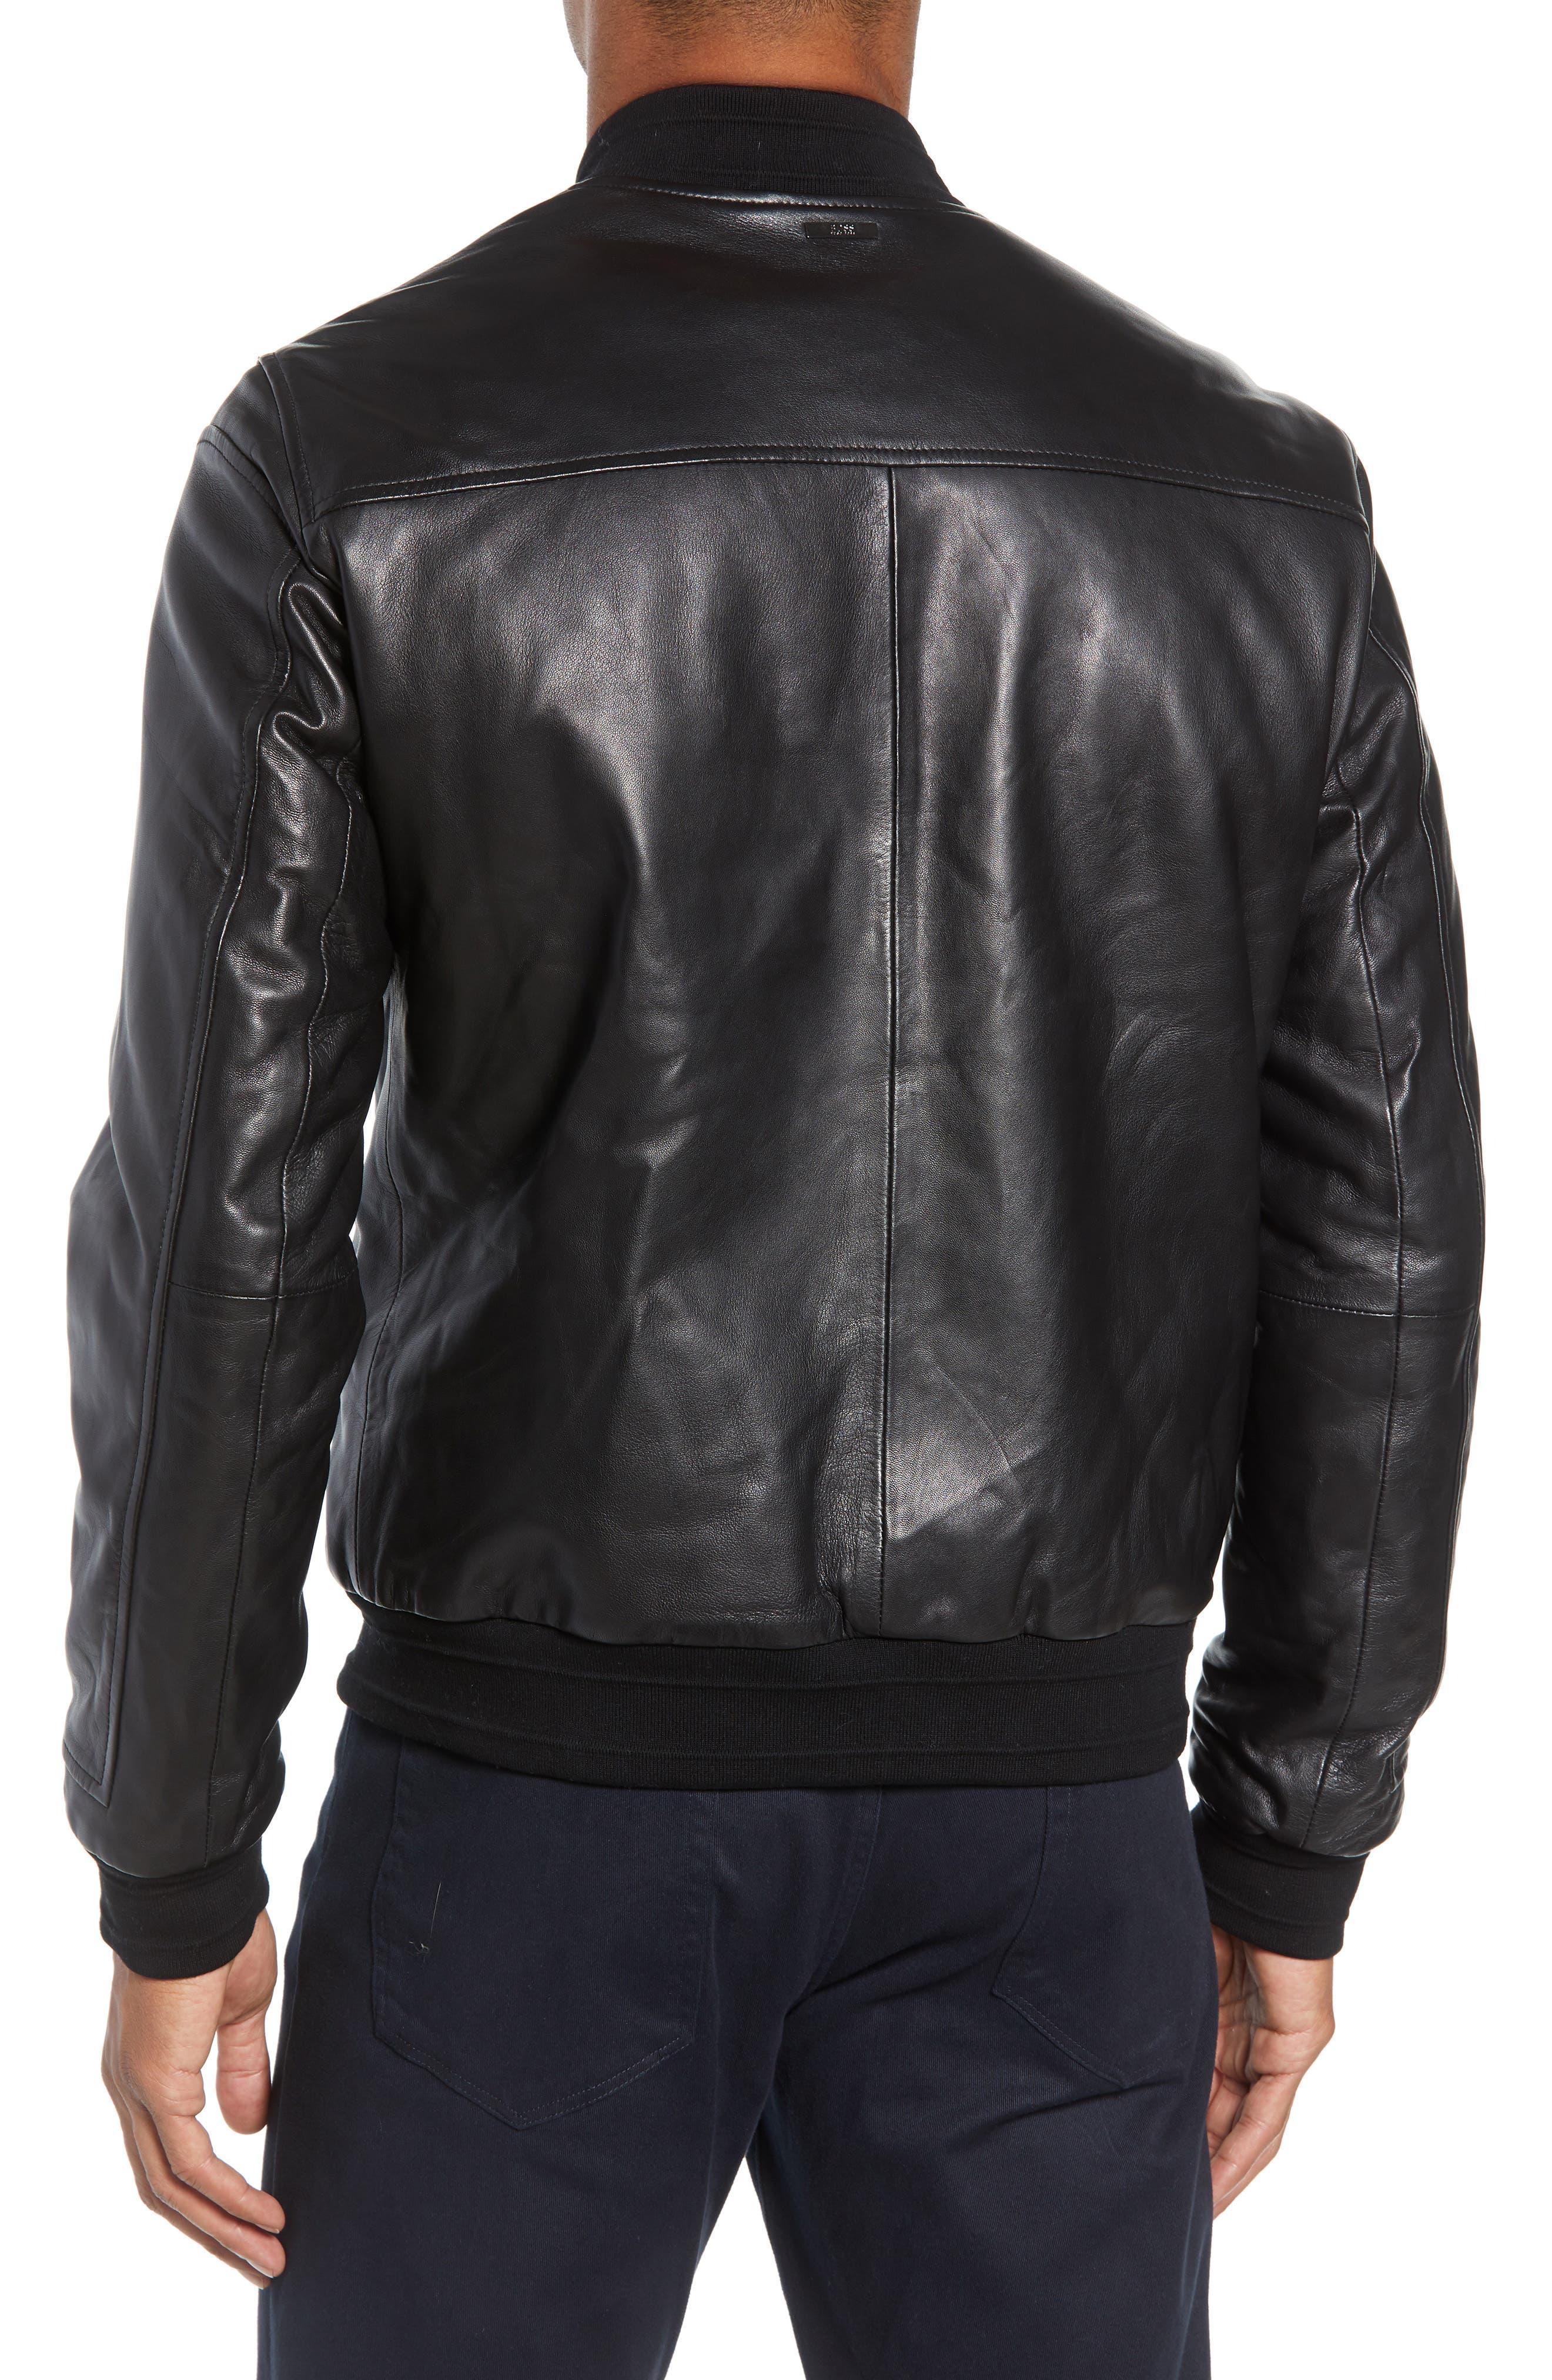 Arinos Leather Bomber Jacket,                             Alternate thumbnail 2, color,                             BLACK